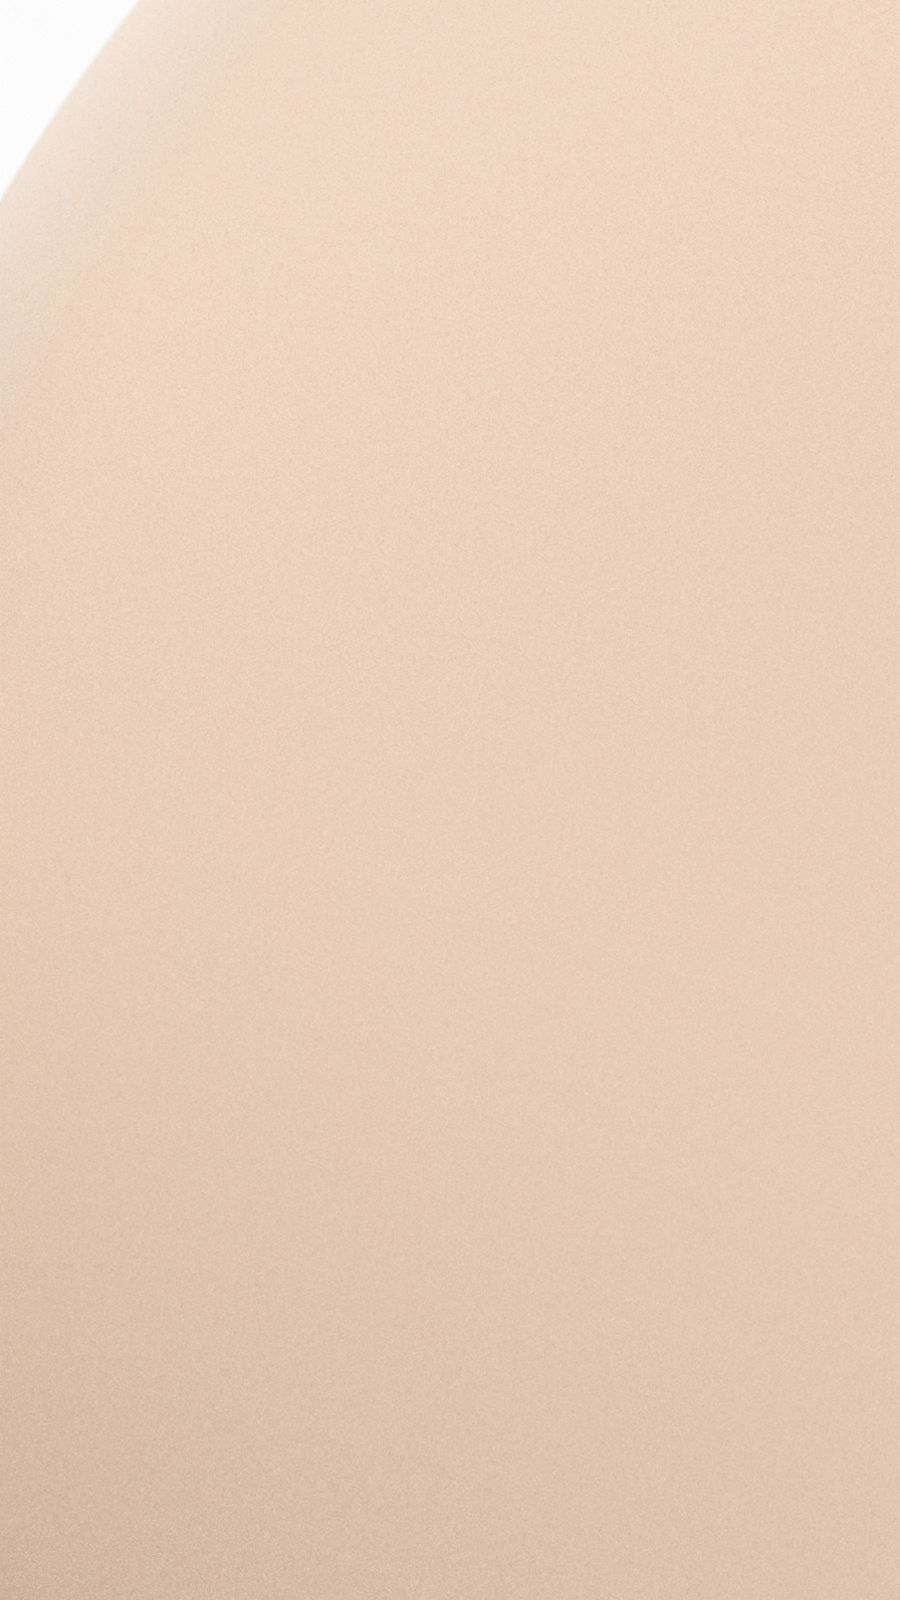 Nude beige 100 Nail Polish - Nude Beige No.100 - Image 2